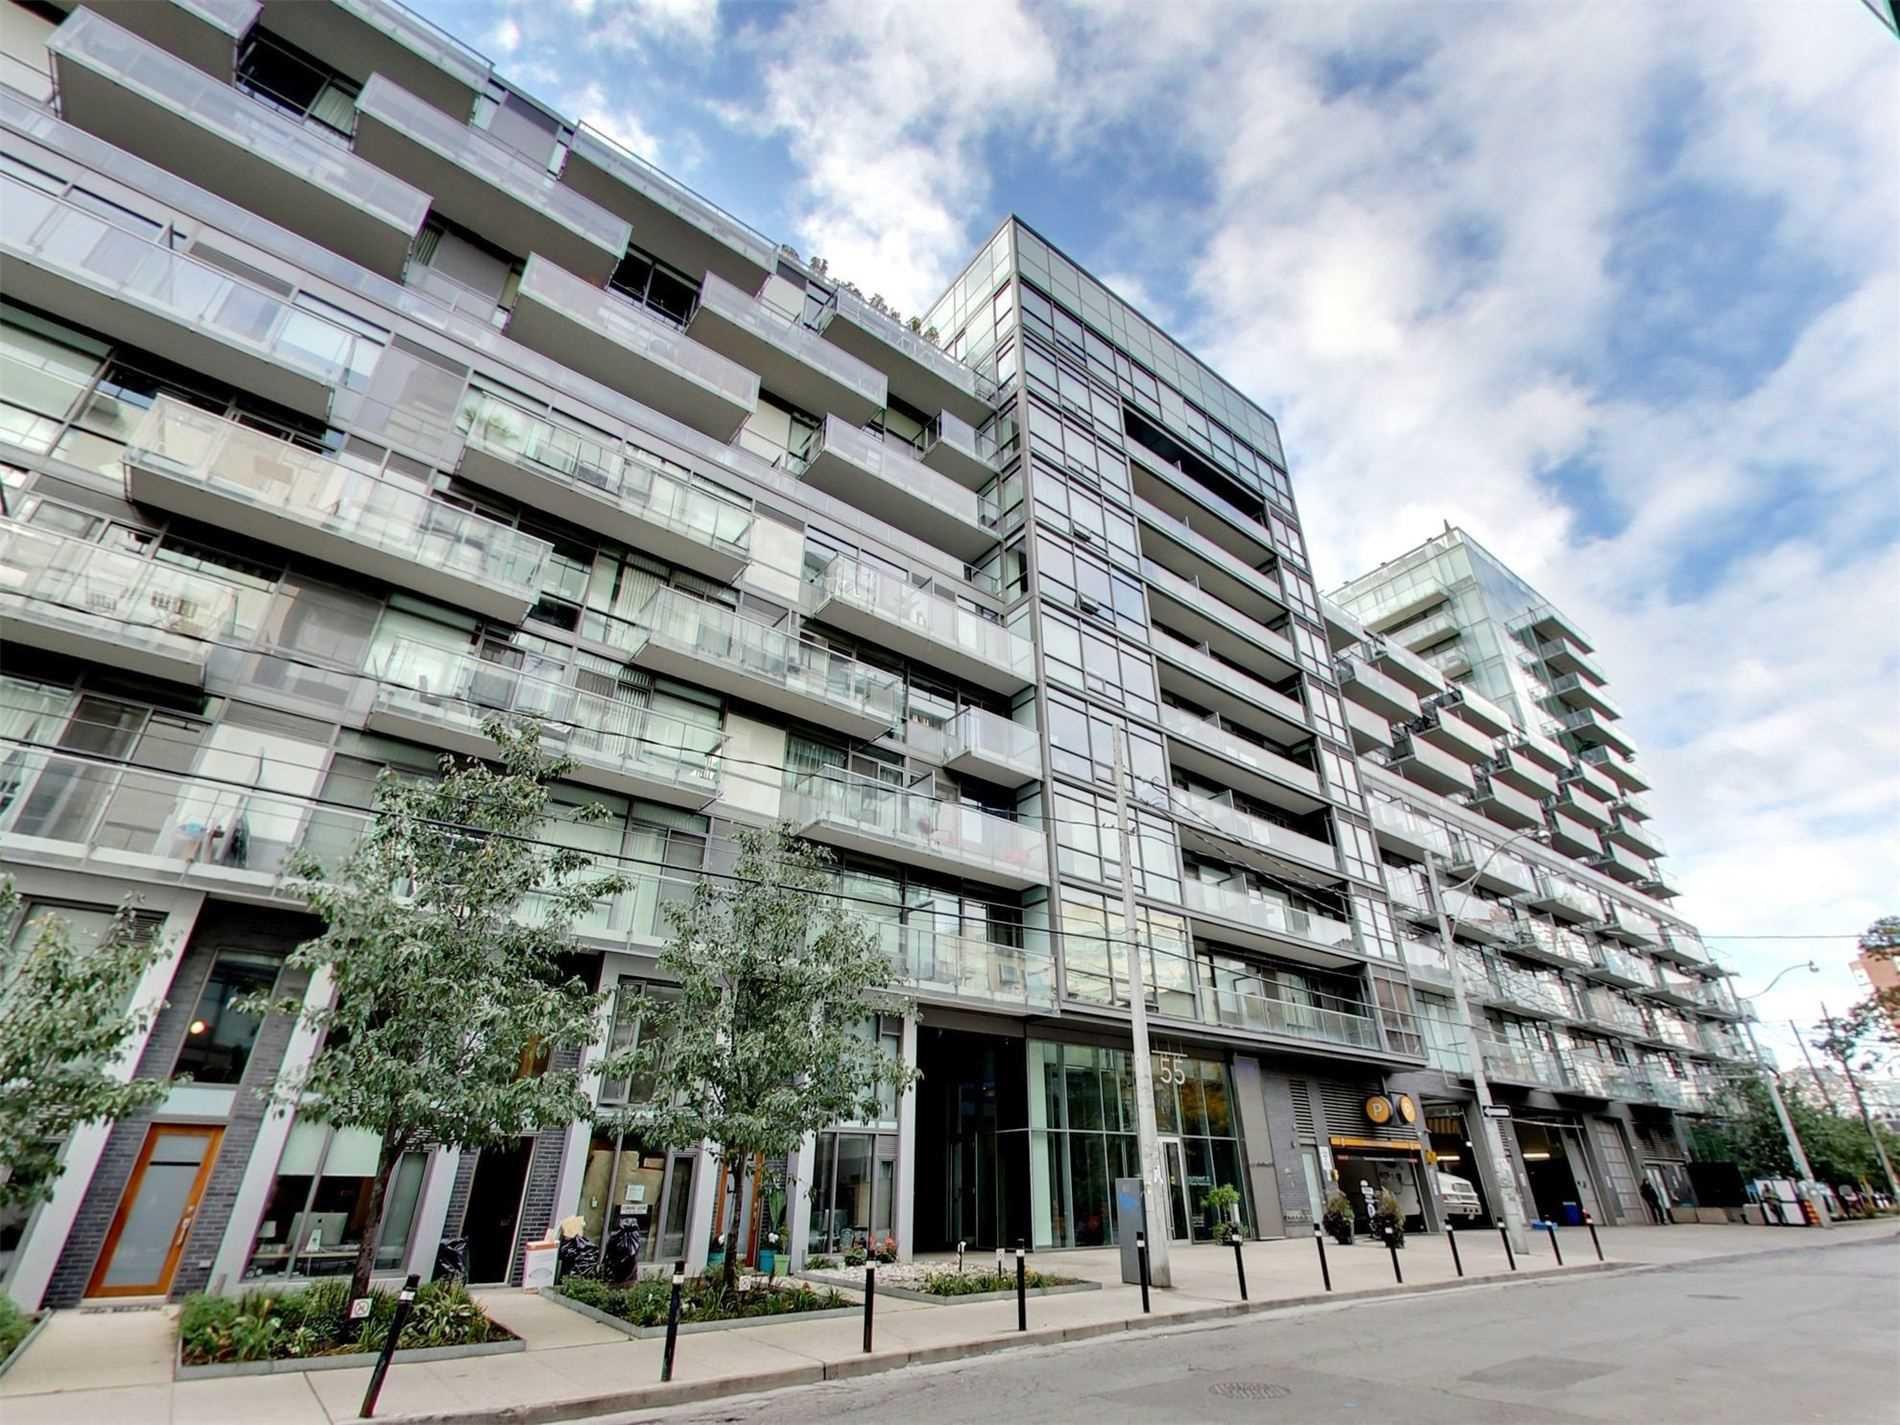 Photo 15: Photos: 818 55 Stewart Street in Toronto: Waterfront Communities C1 Condo for sale (Toronto C01)  : MLS®# C4690098